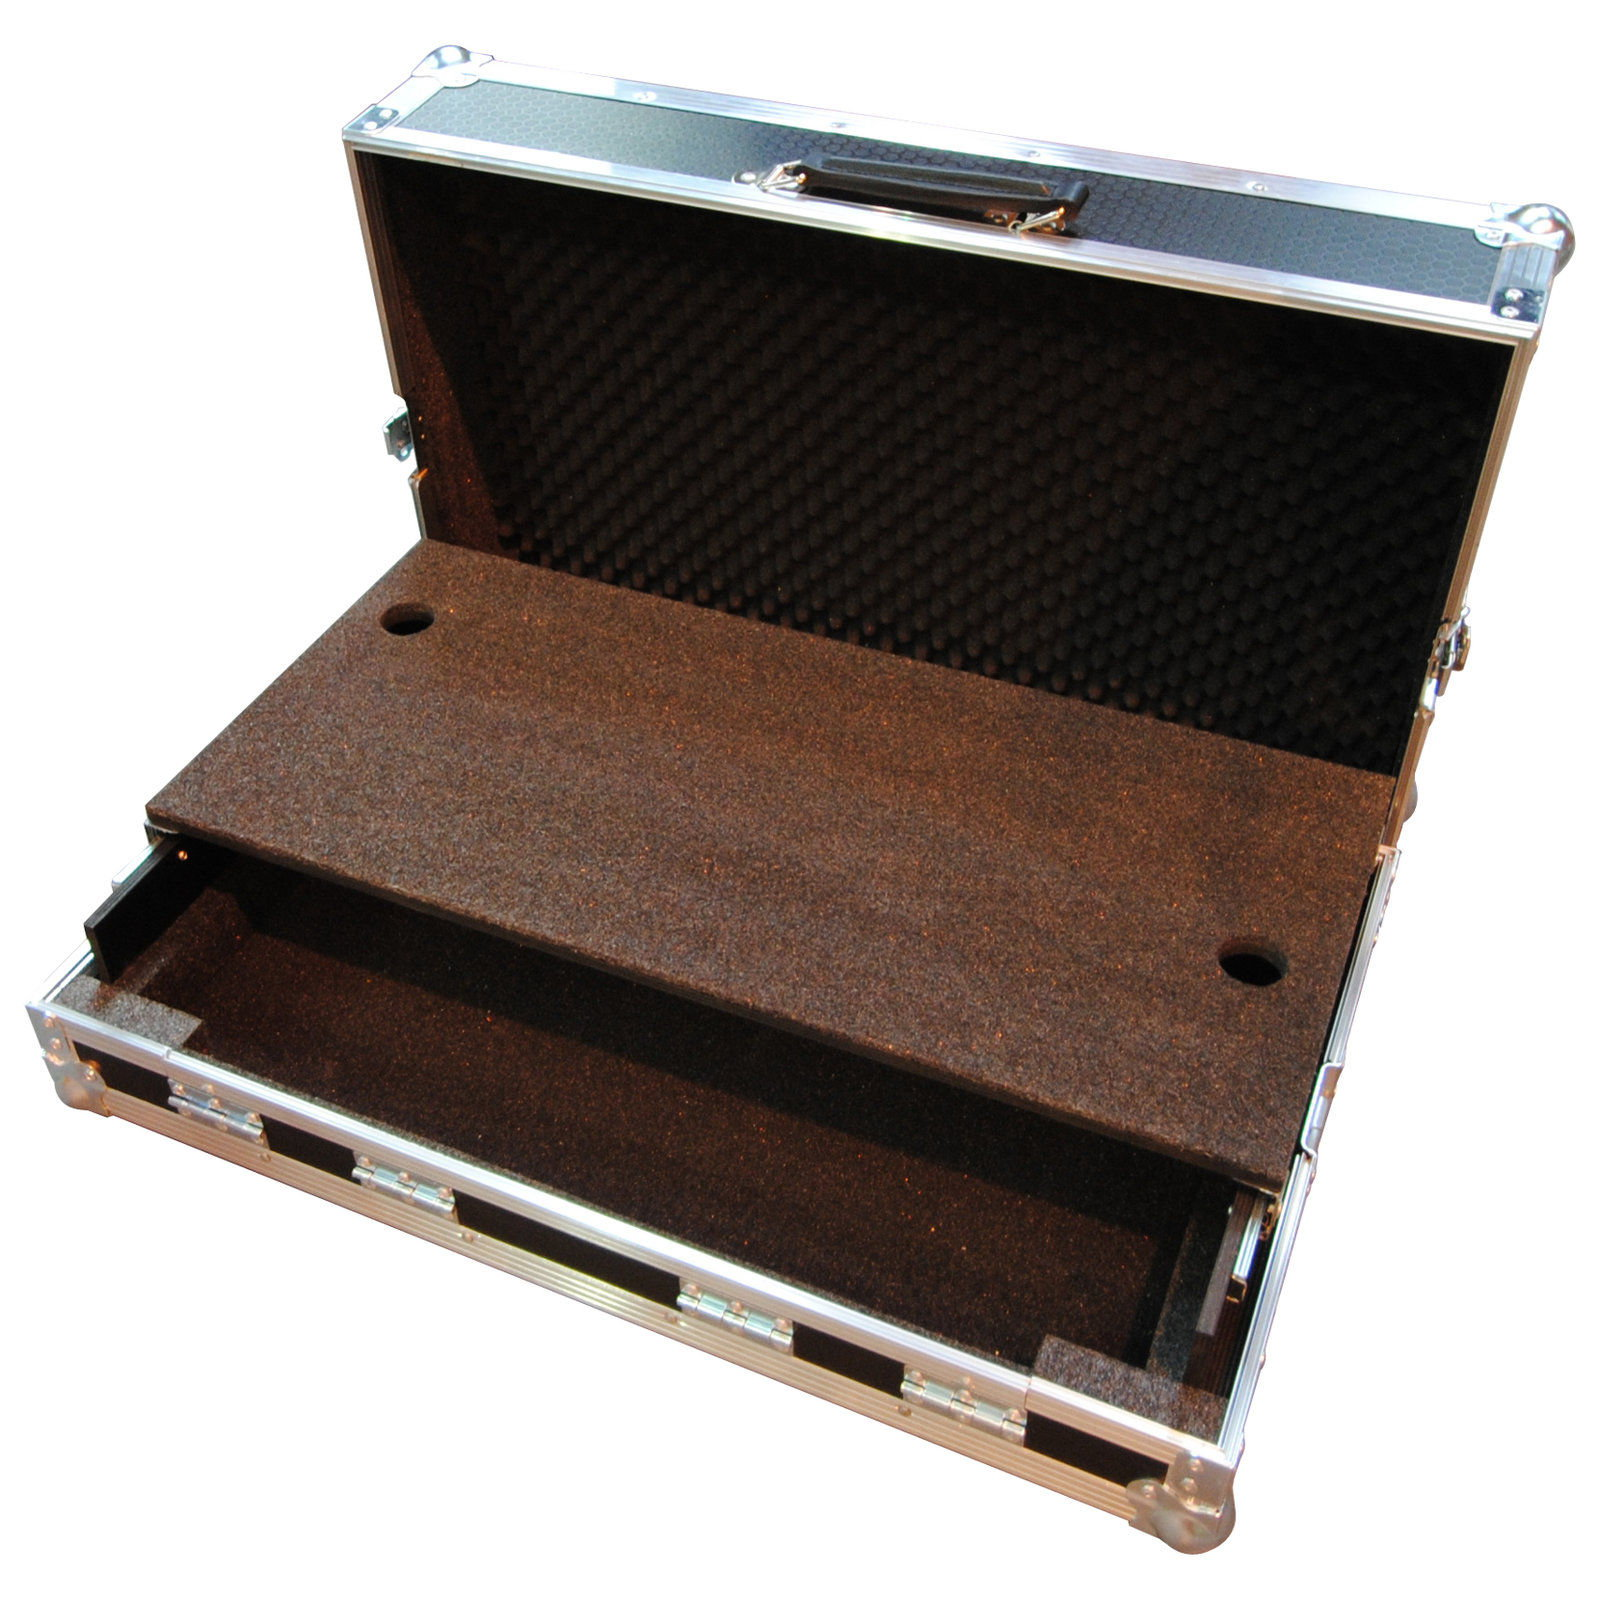 pioneer ddj sx dj controller flight case. Black Bedroom Furniture Sets. Home Design Ideas